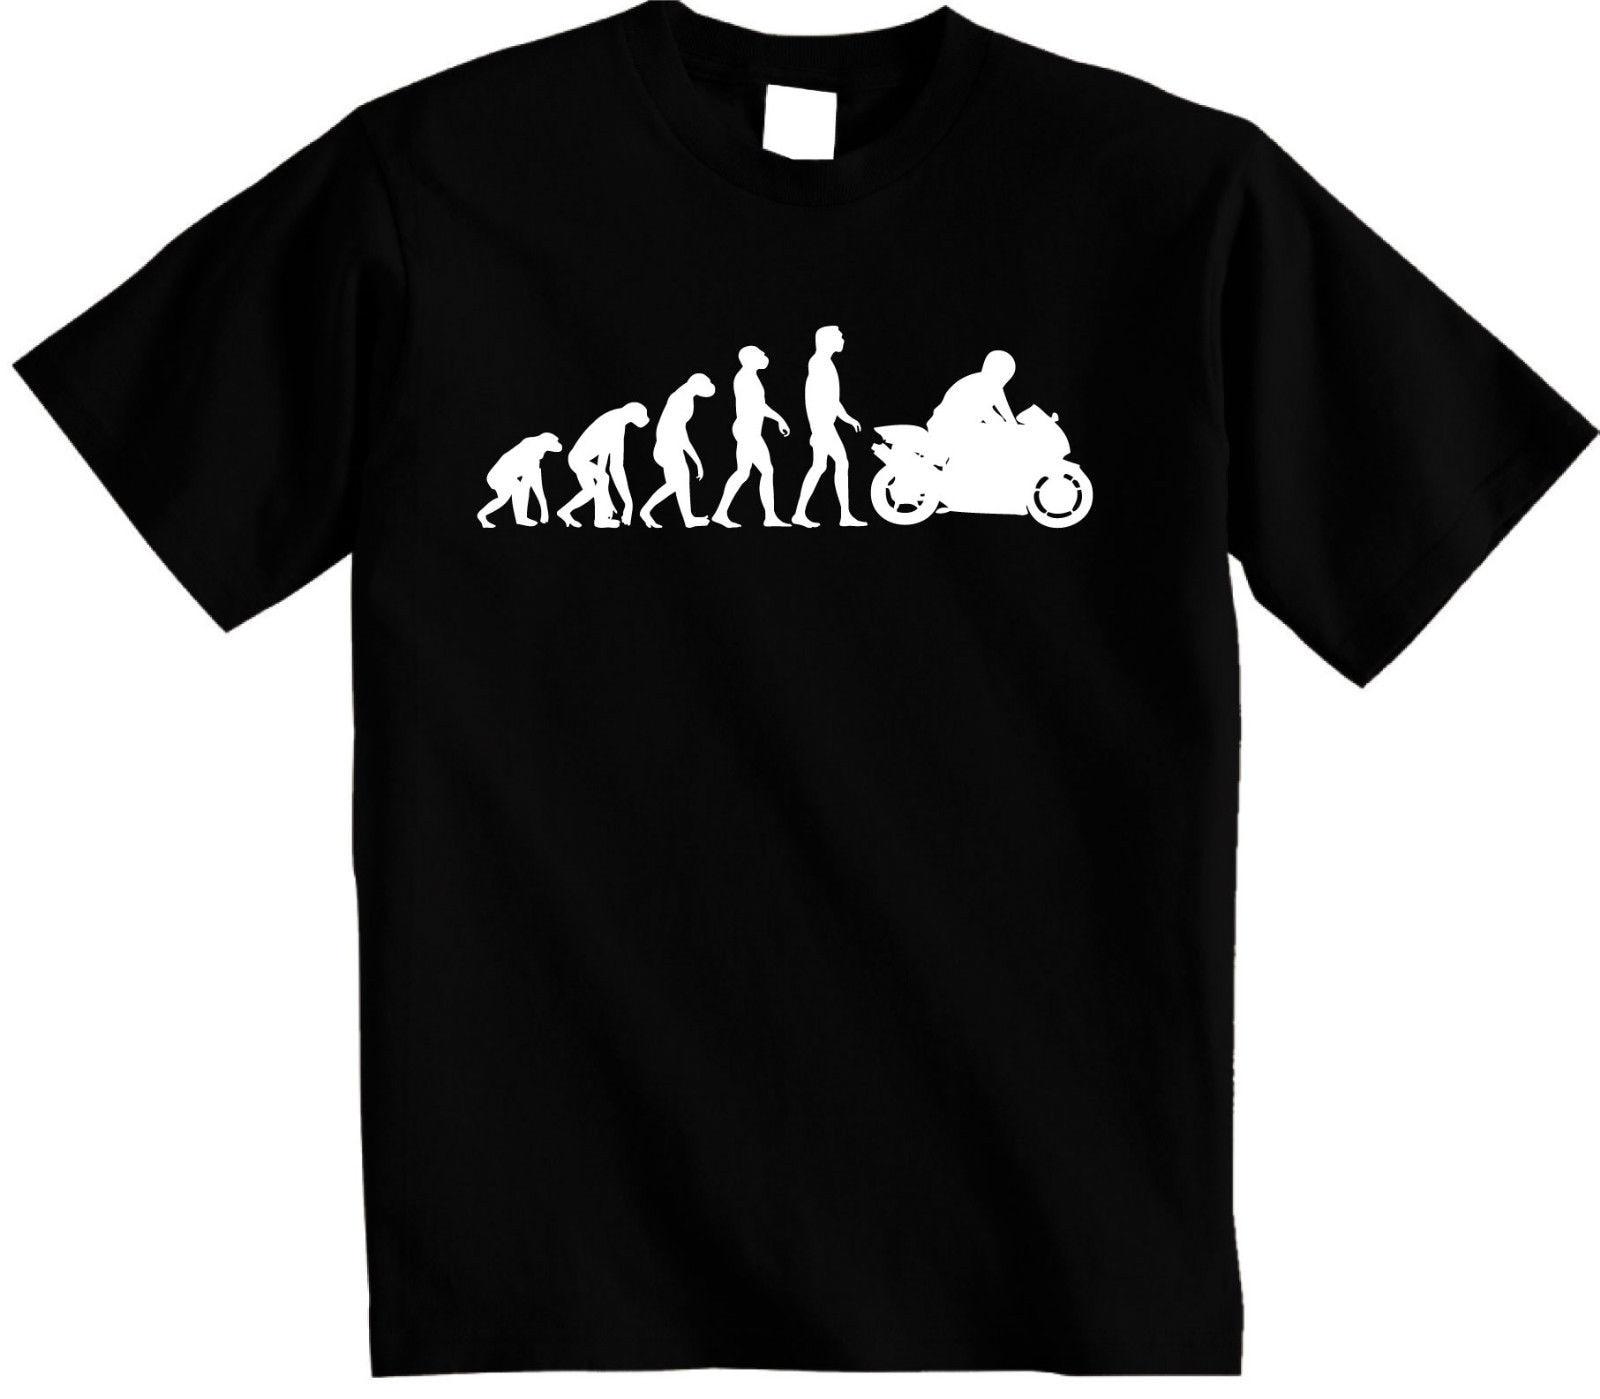 Summer Mens Summer Tops Tees T Shirt Motorbike T-Shirt | Evolution of Motorcycle Biker Premium T Shirt funny Cotton Tee